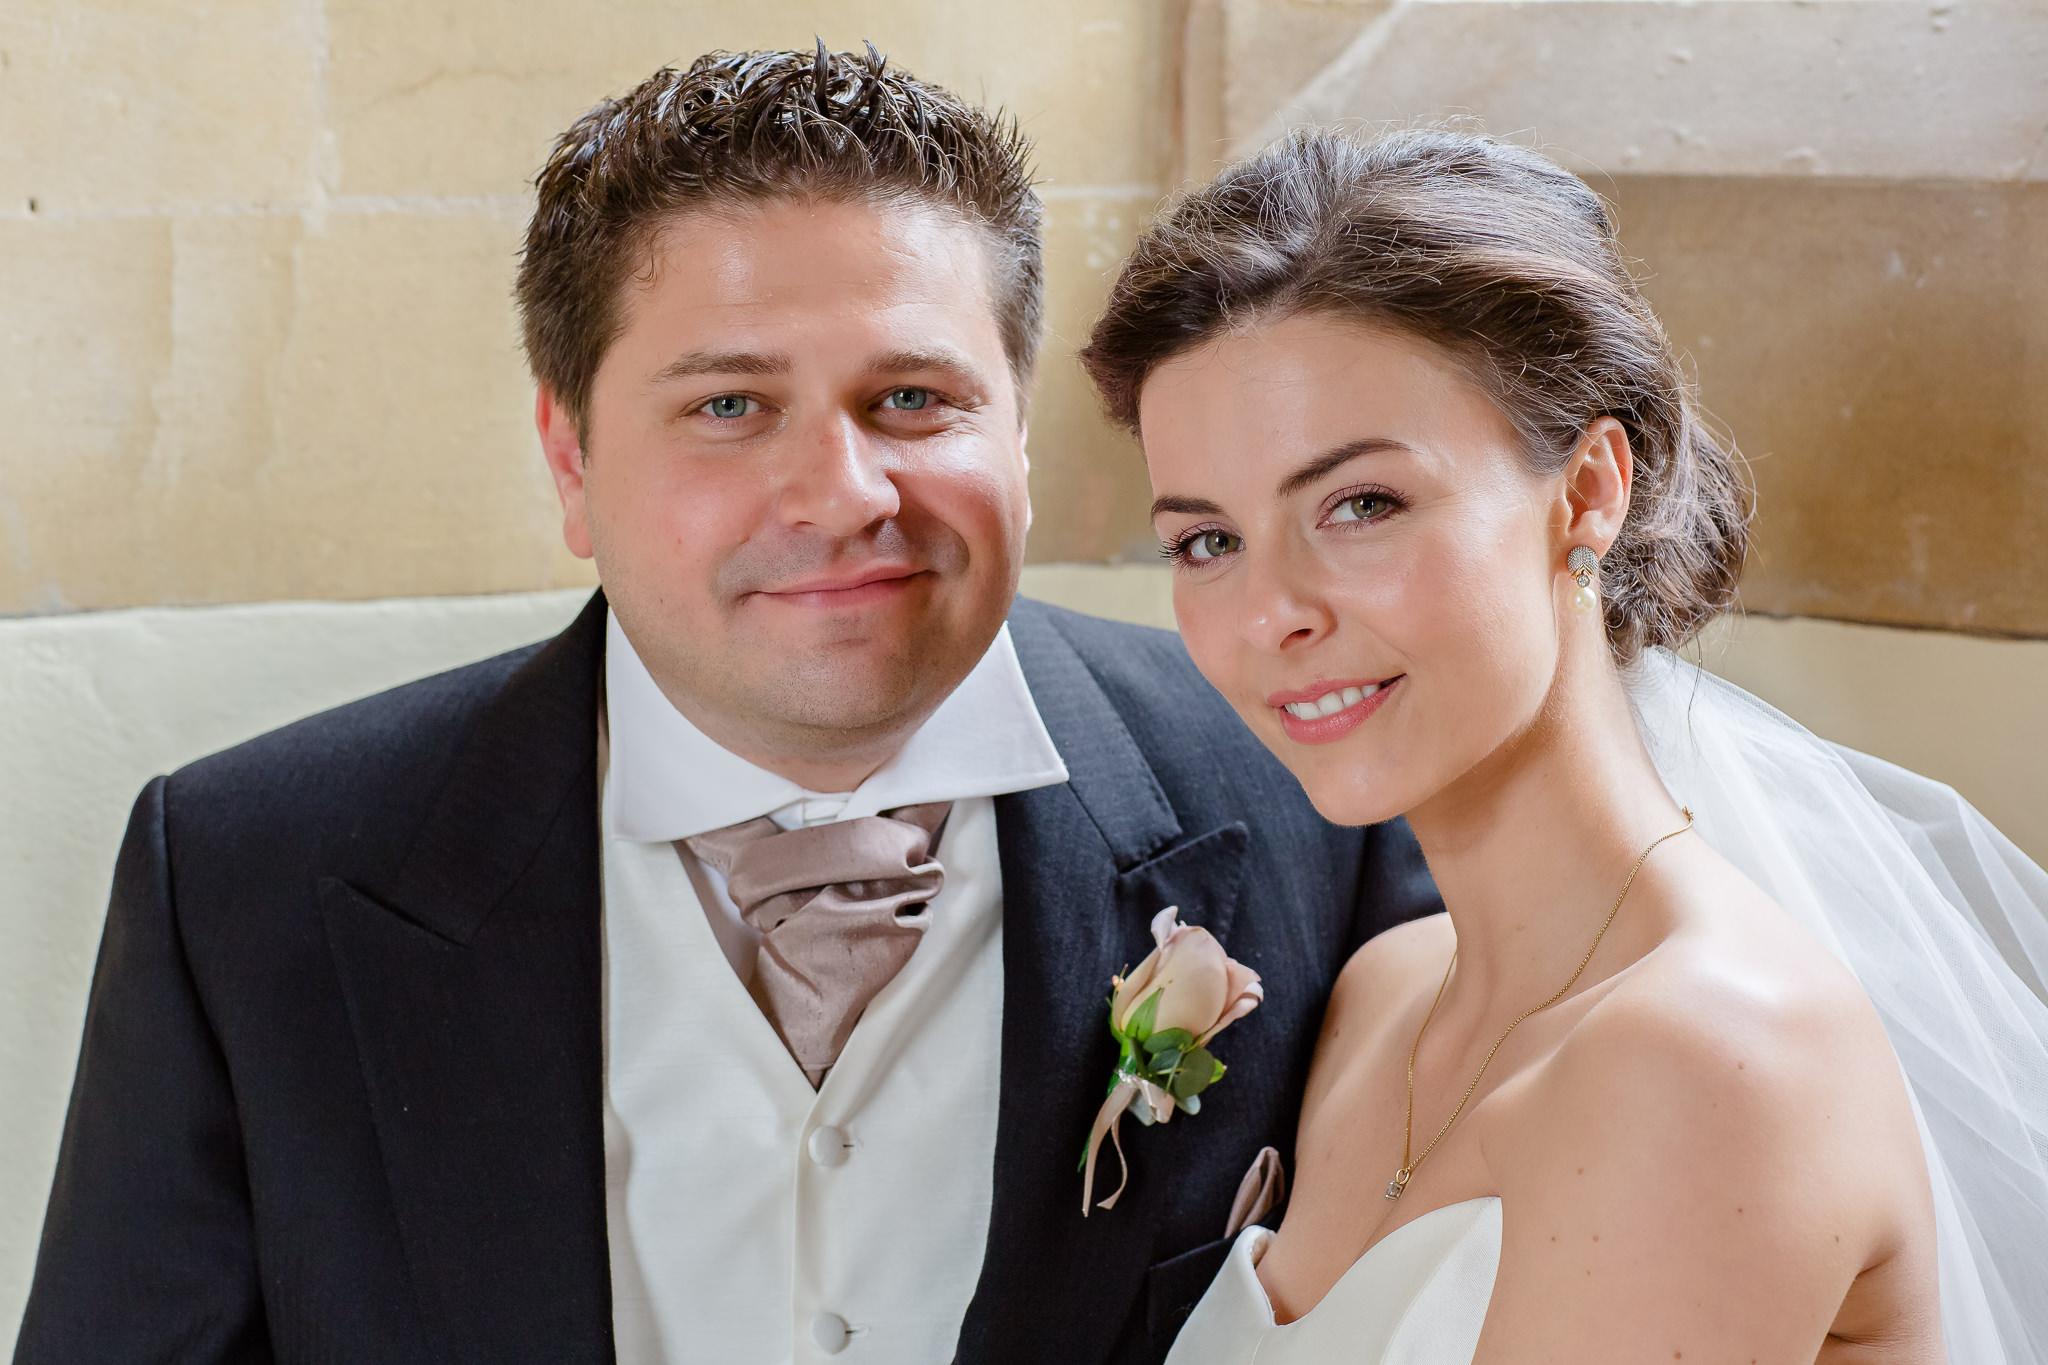 Reportage-wedding-photographer-in-Berkshire